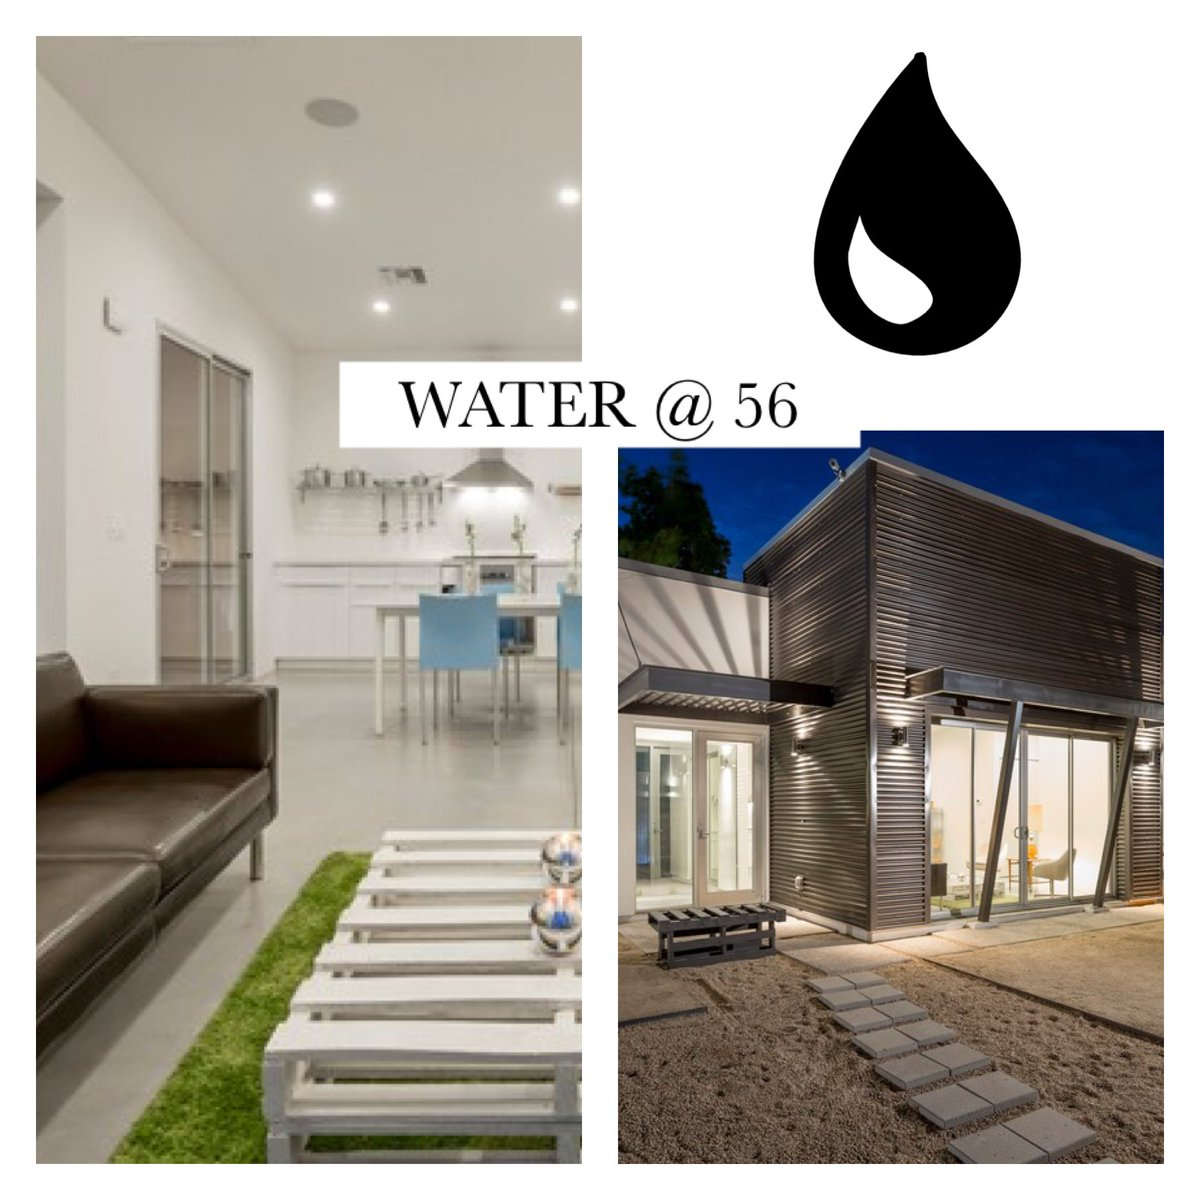 WATER #Azarchitecture #design #architecture #architect #phoenix #arizona #myphx #modernphoenix #home #house #Realestate #homeinspo #homeideas  #hgtv #archilovers #casa #arquitetura #arquitectura #renovation #remodel #addition #deserthouse #modernhouse #bathroompic.twitter.com/fDDiOWJsS1